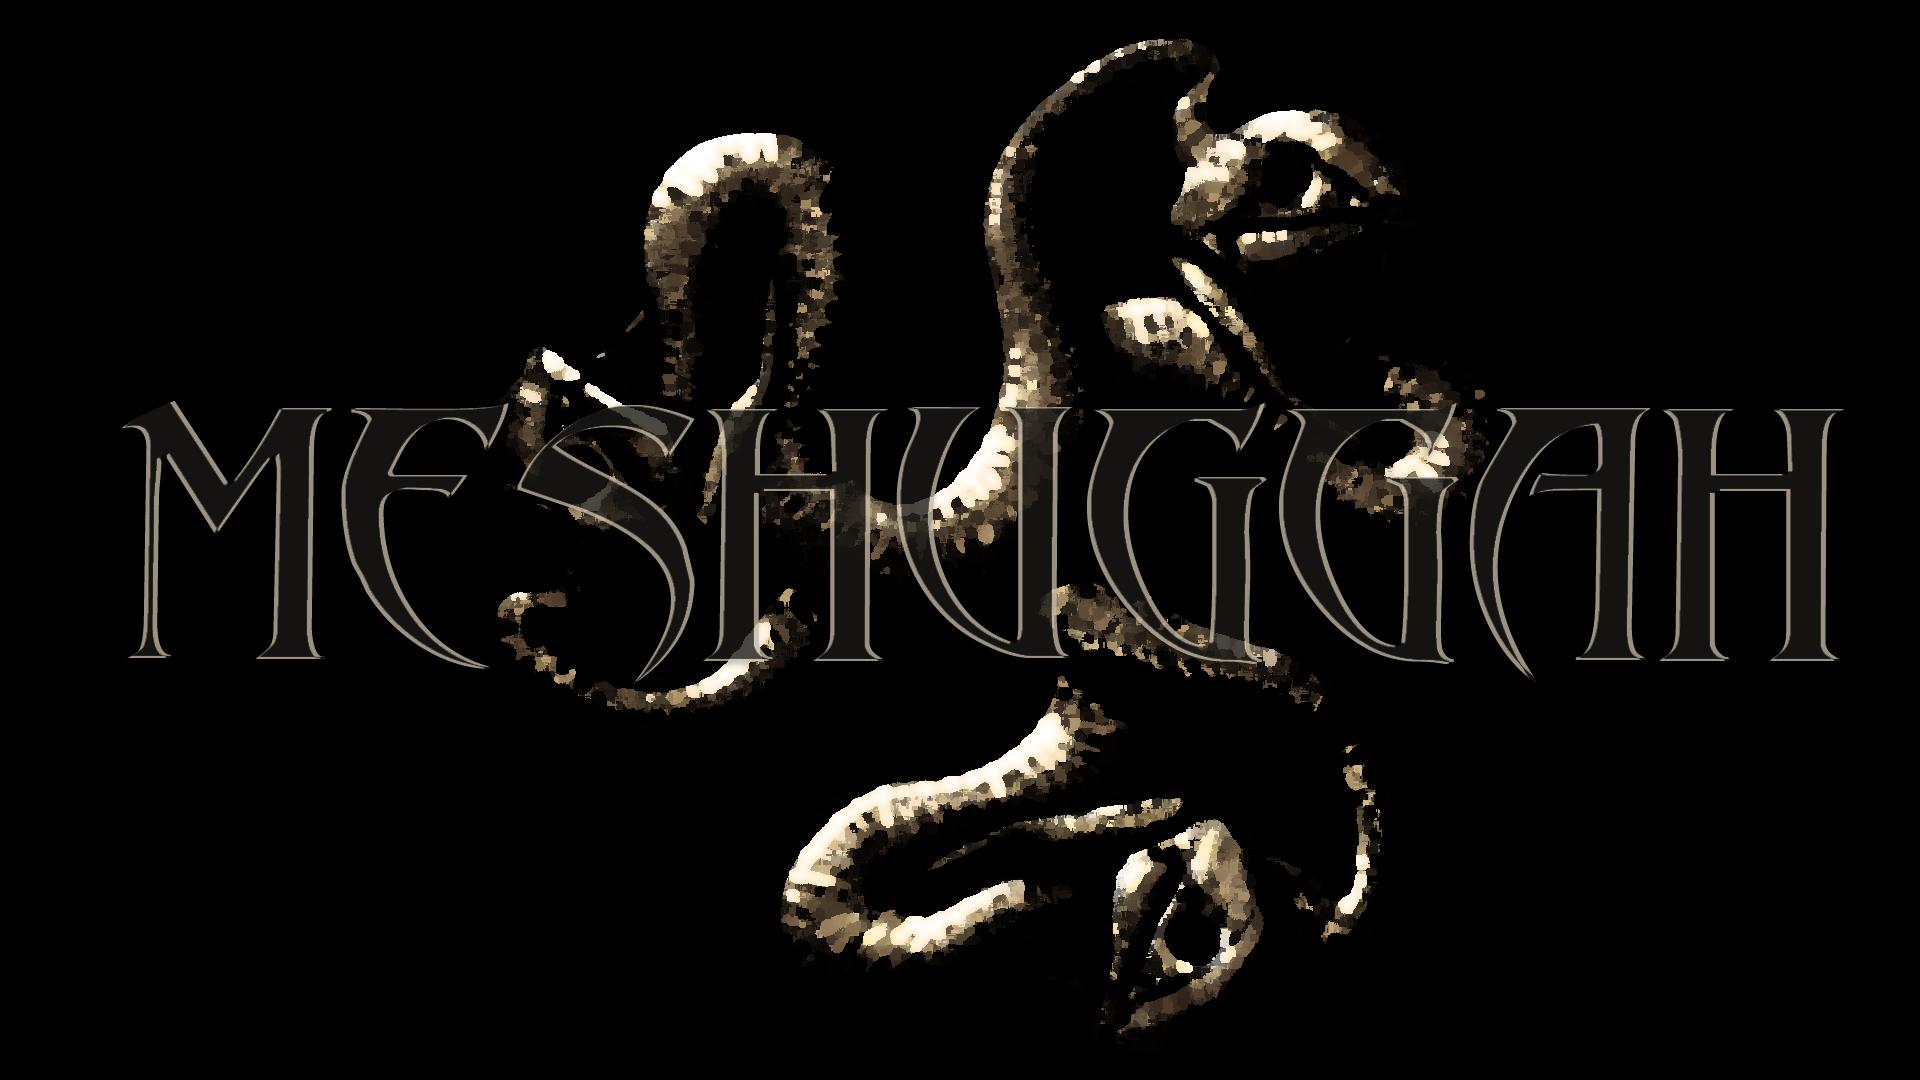 Meshuggah Hd Wallpaper Background Image 1920x1080 Id